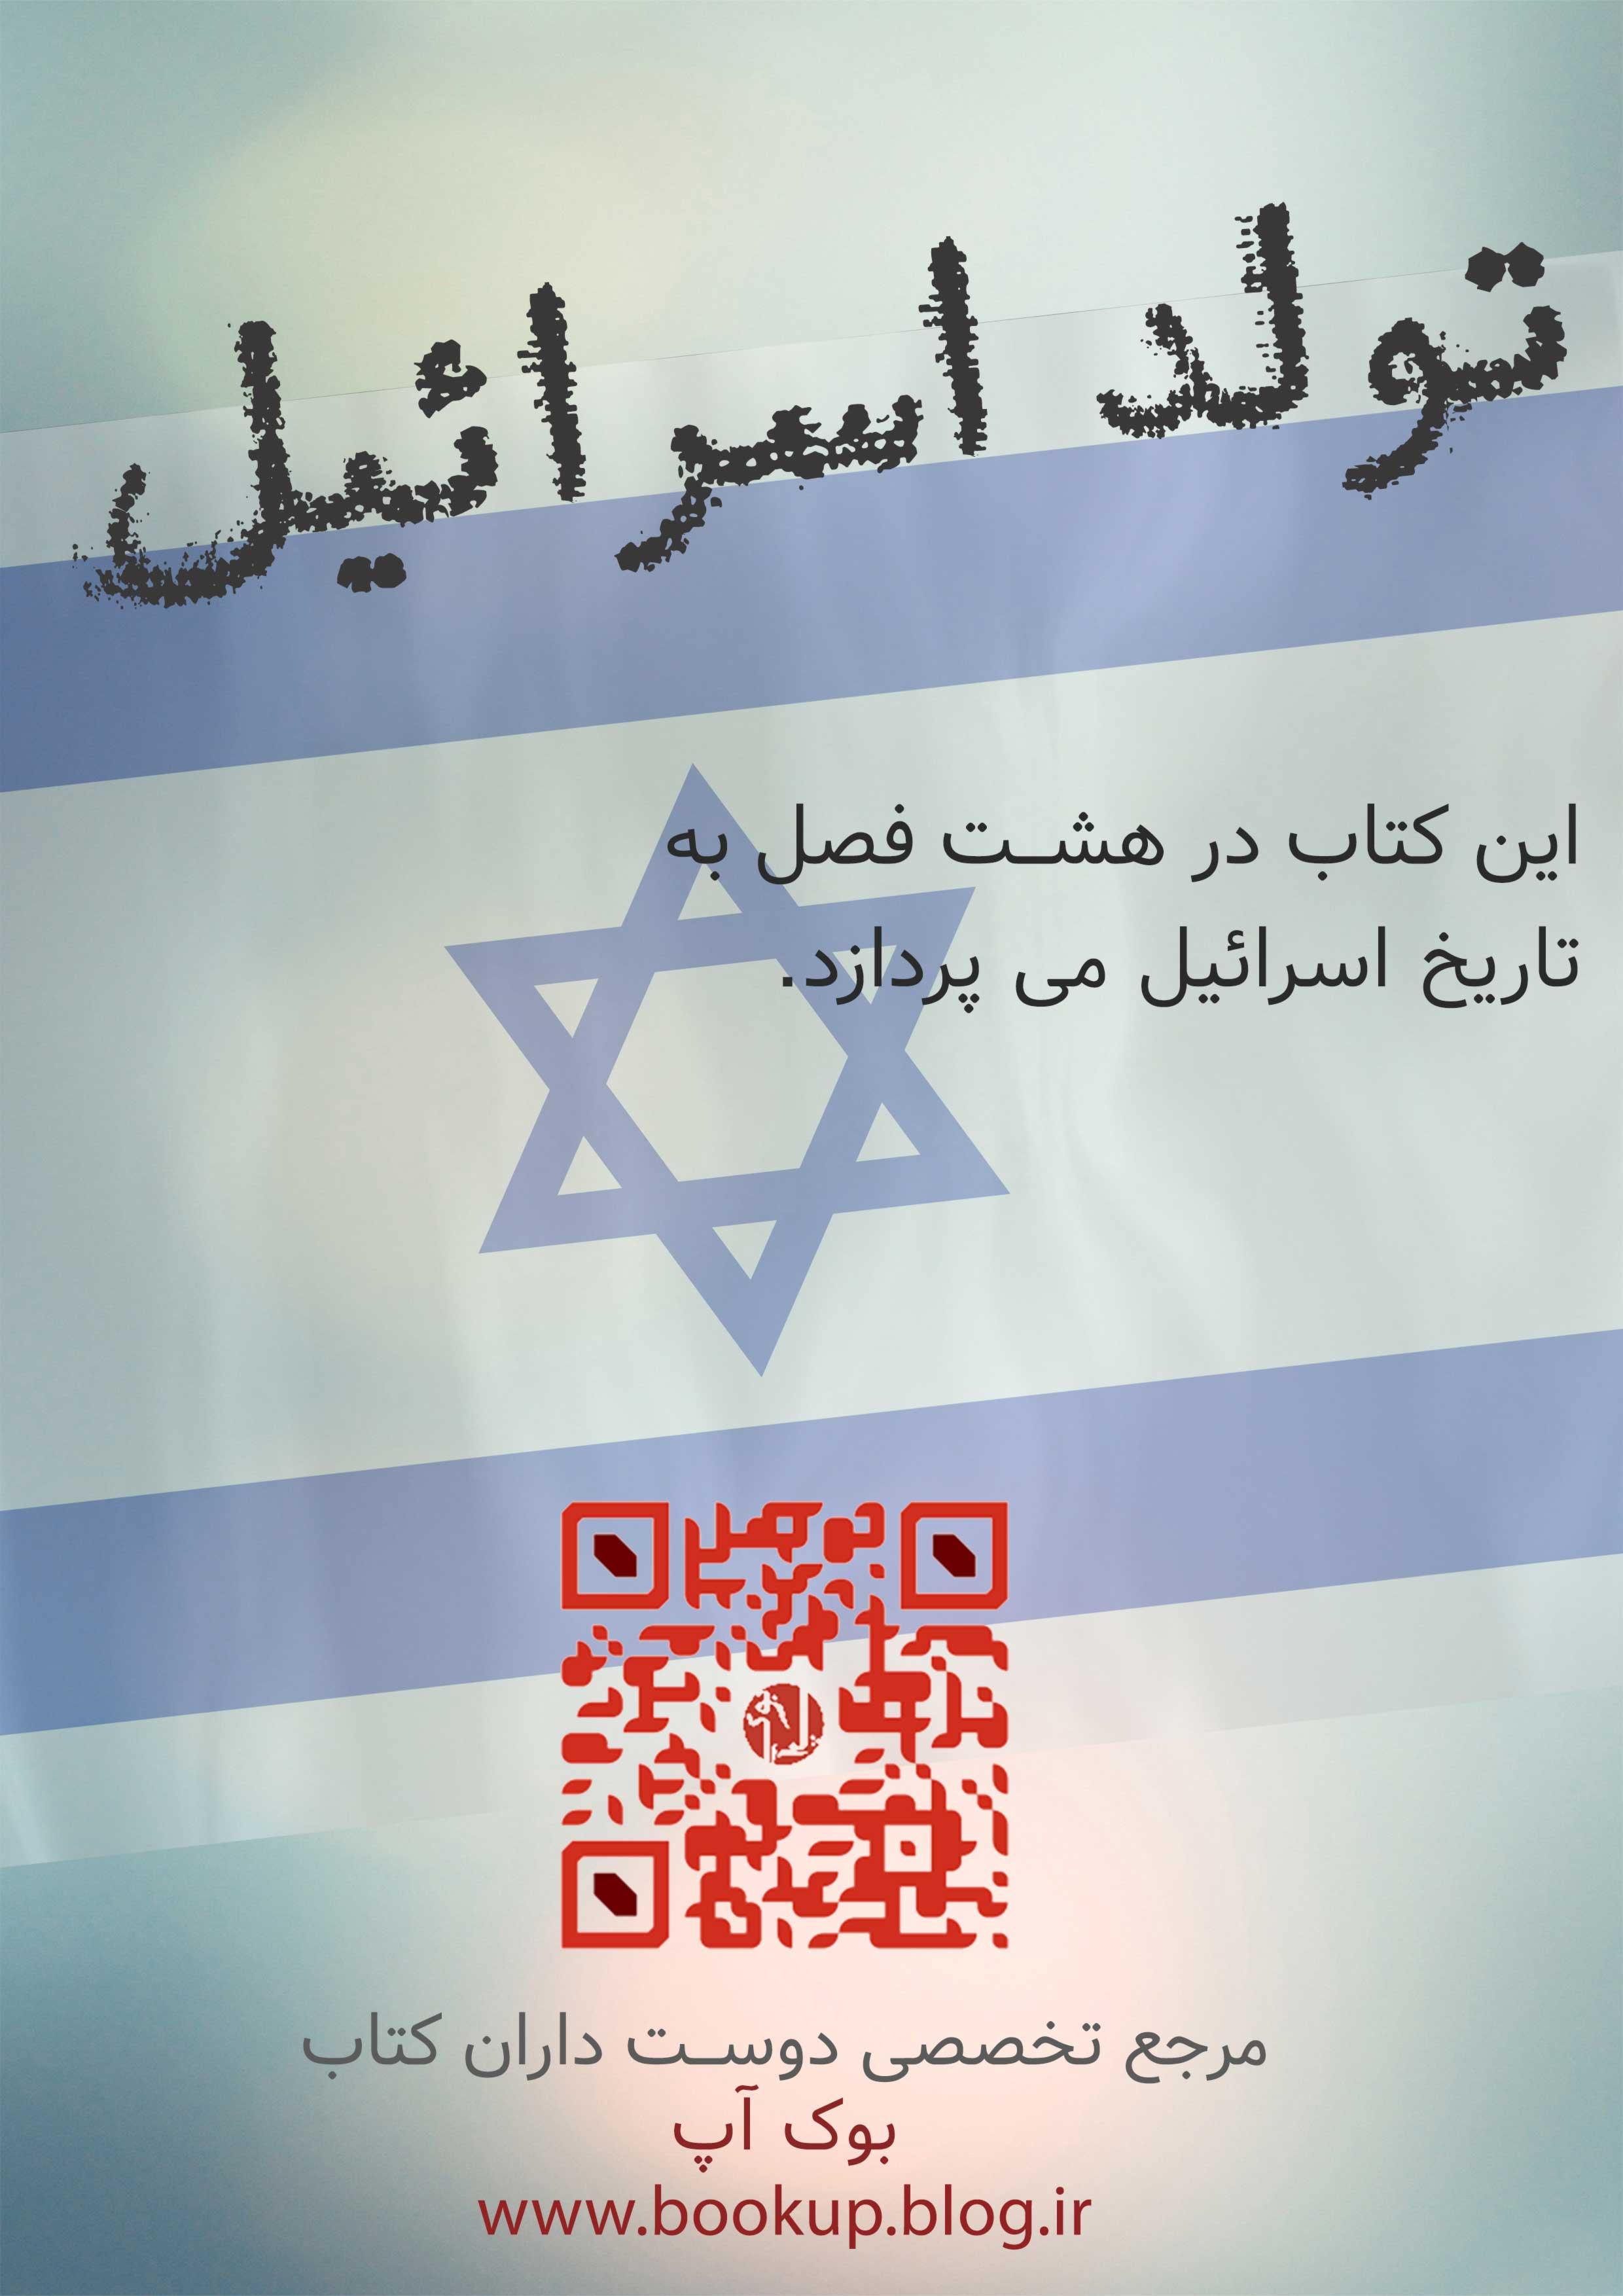 تولد اسرائیل